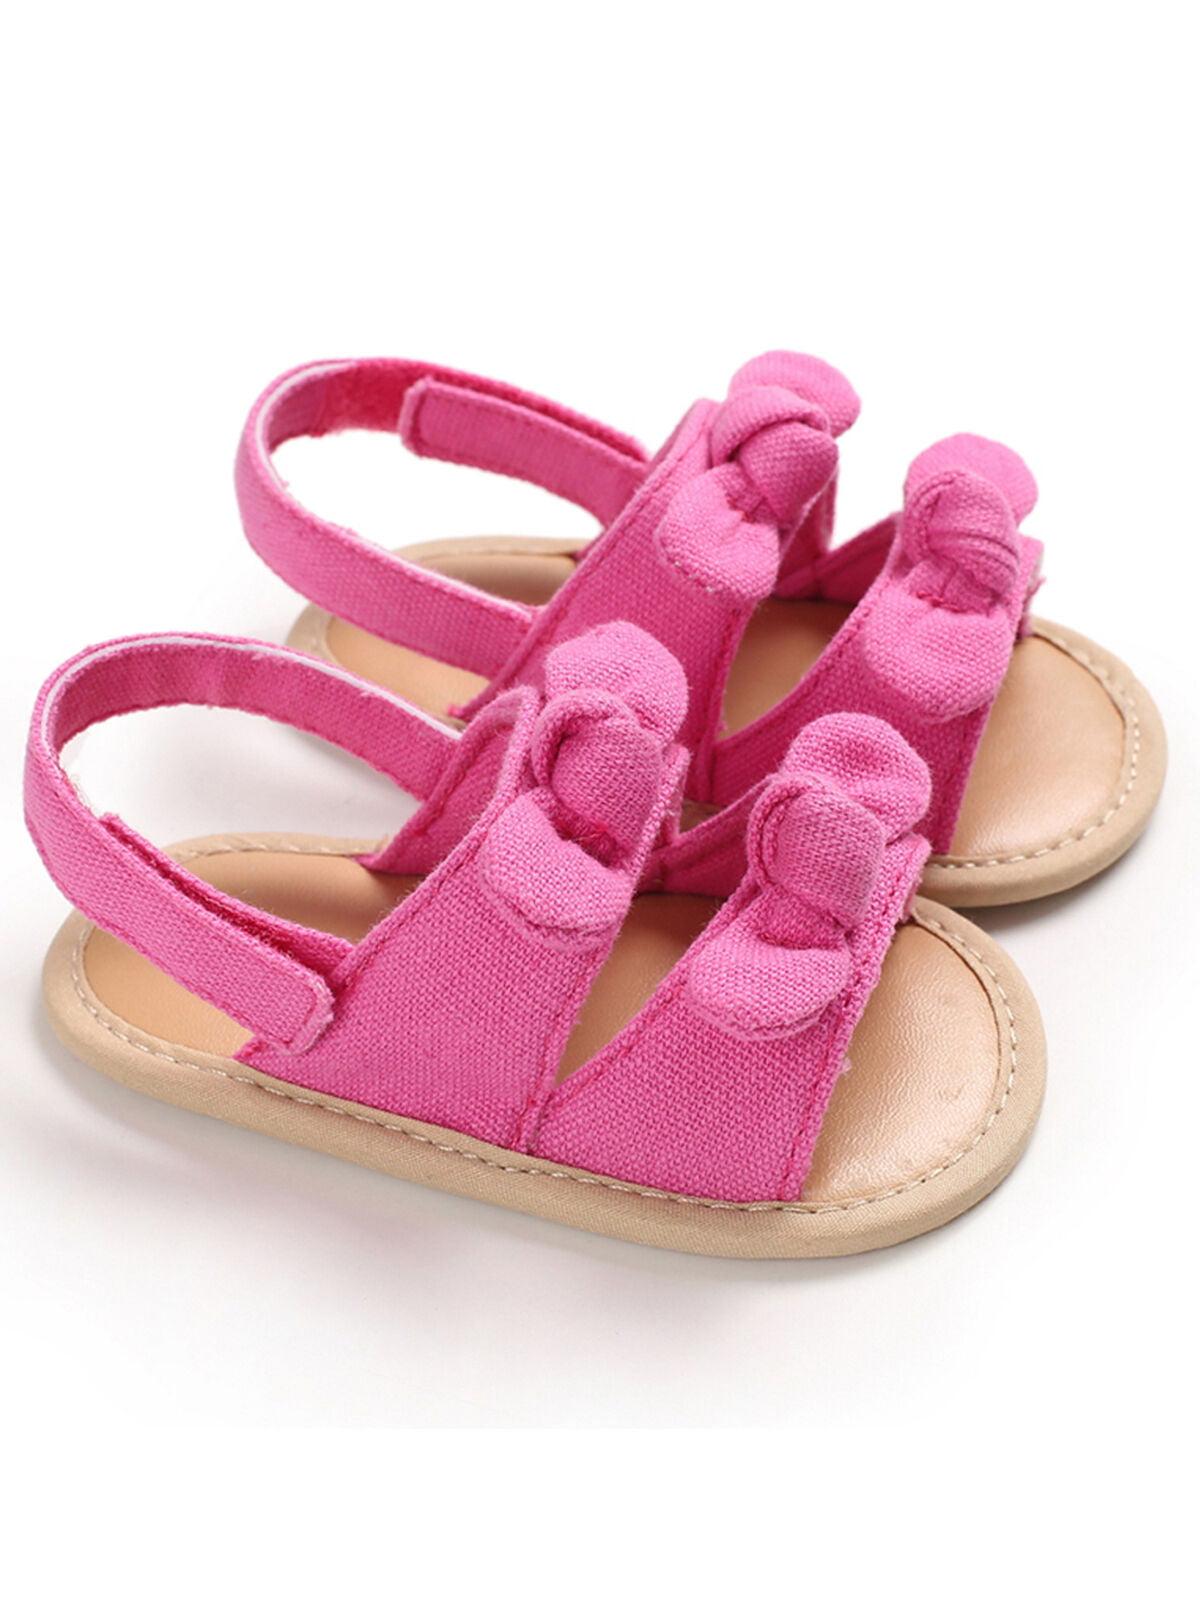 Loalirando Fashion Infant Baby